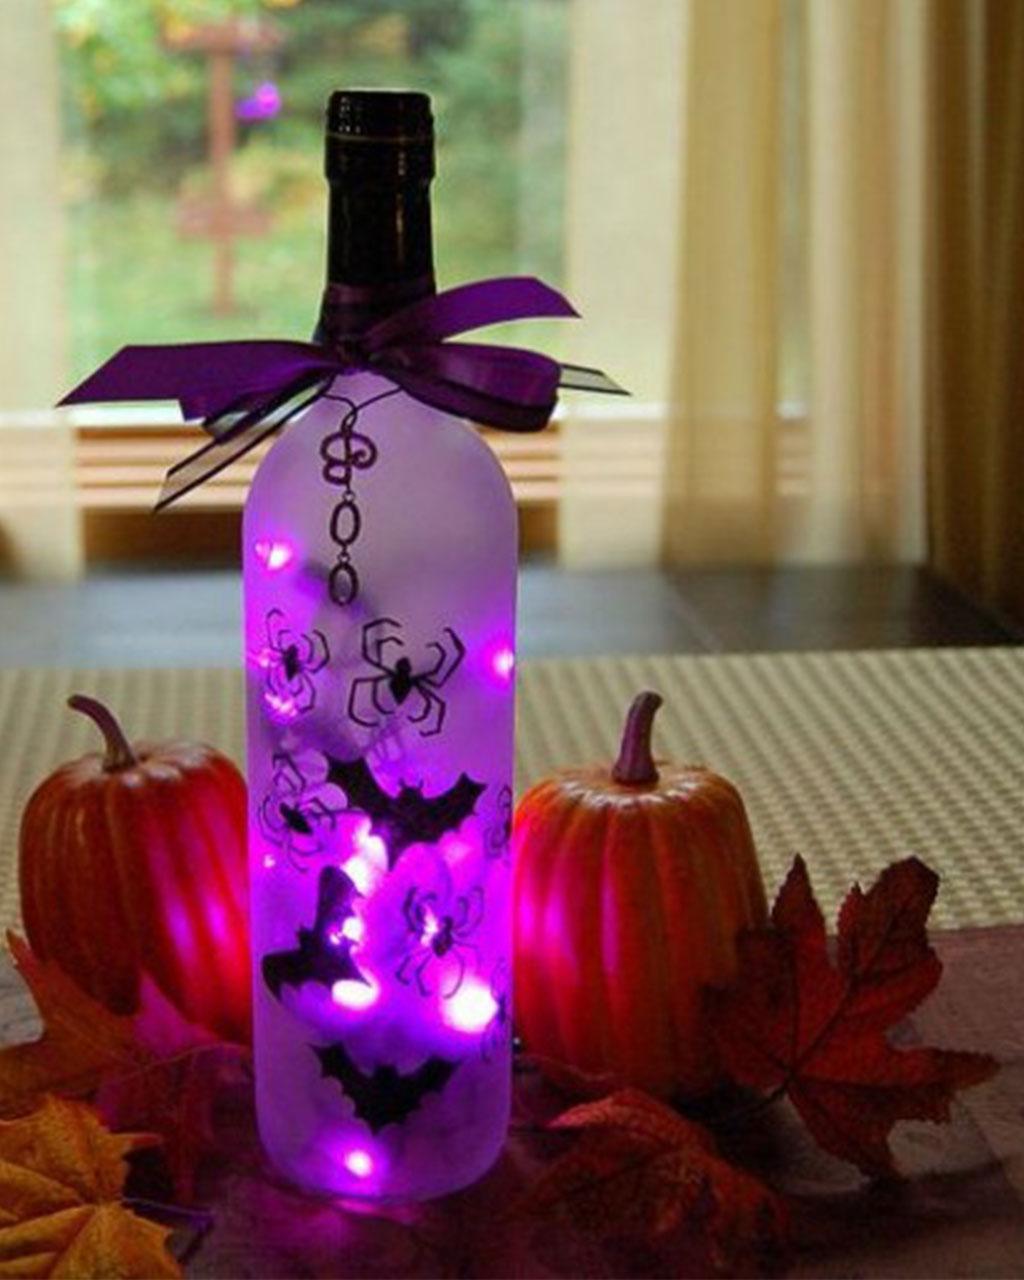 Wine Bottle Turns Into Eerie Light